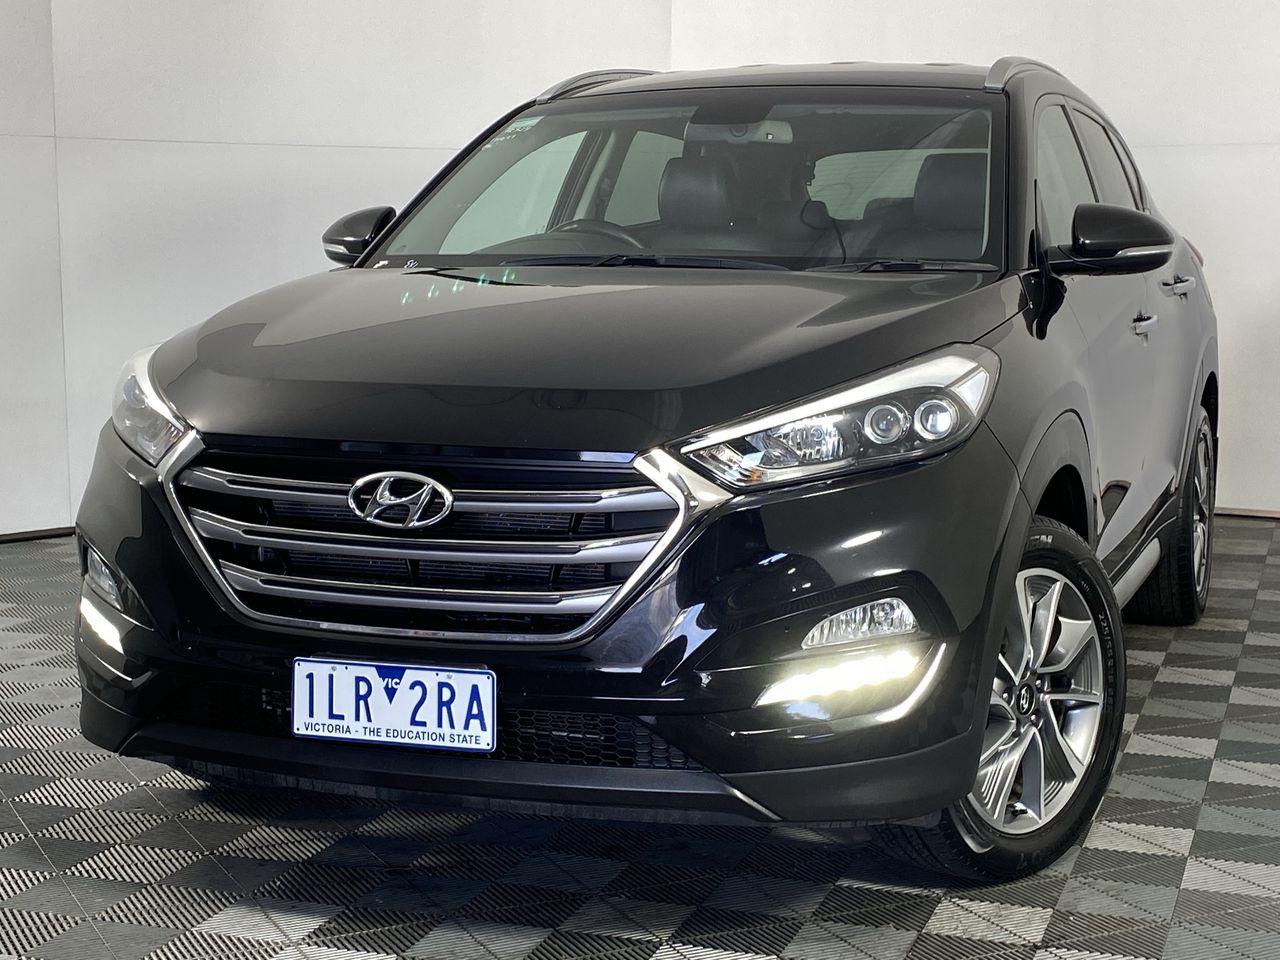 2017 Hyundai Tucson Elite FWD TL Automatic Wagon